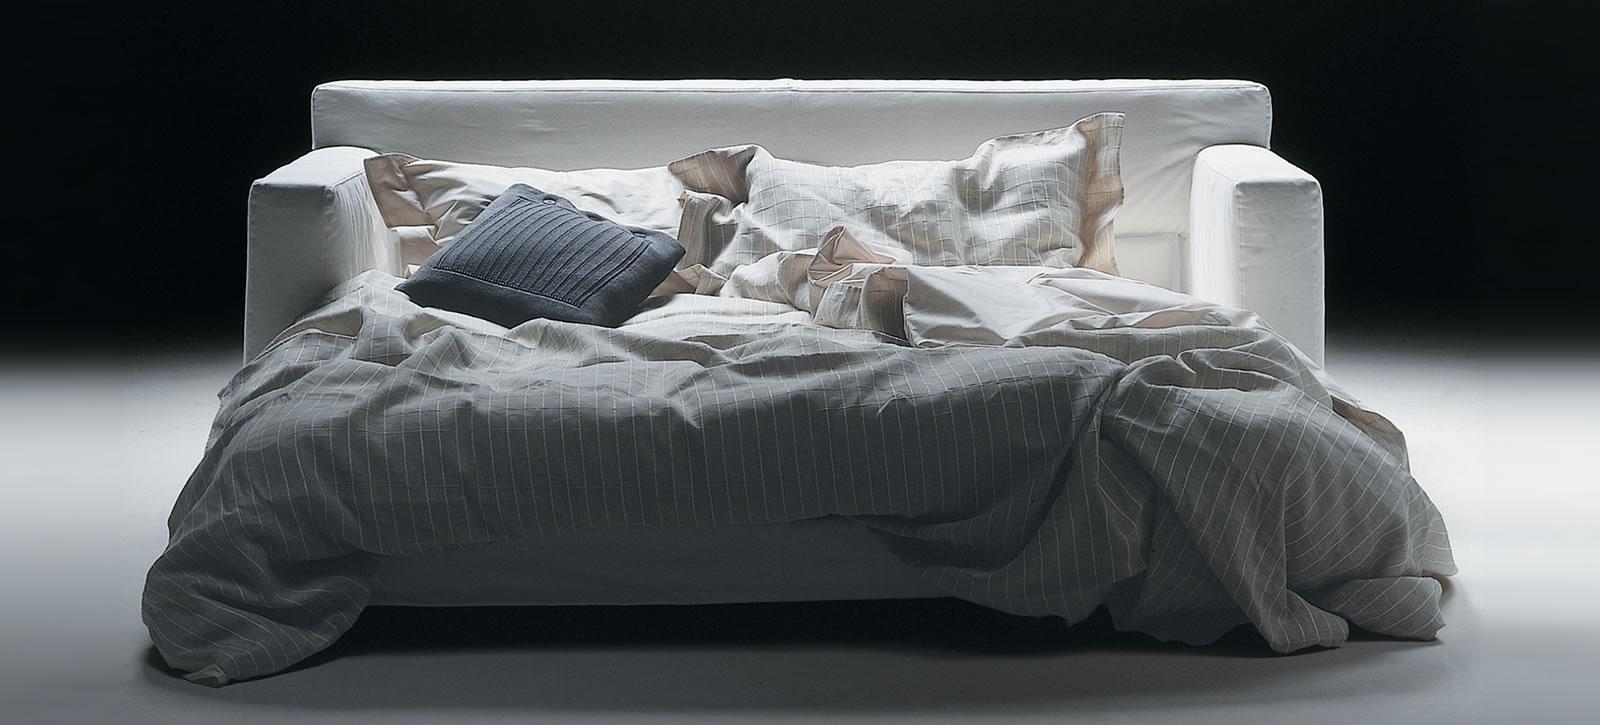 Winny flexform - Flexform divani letto ...